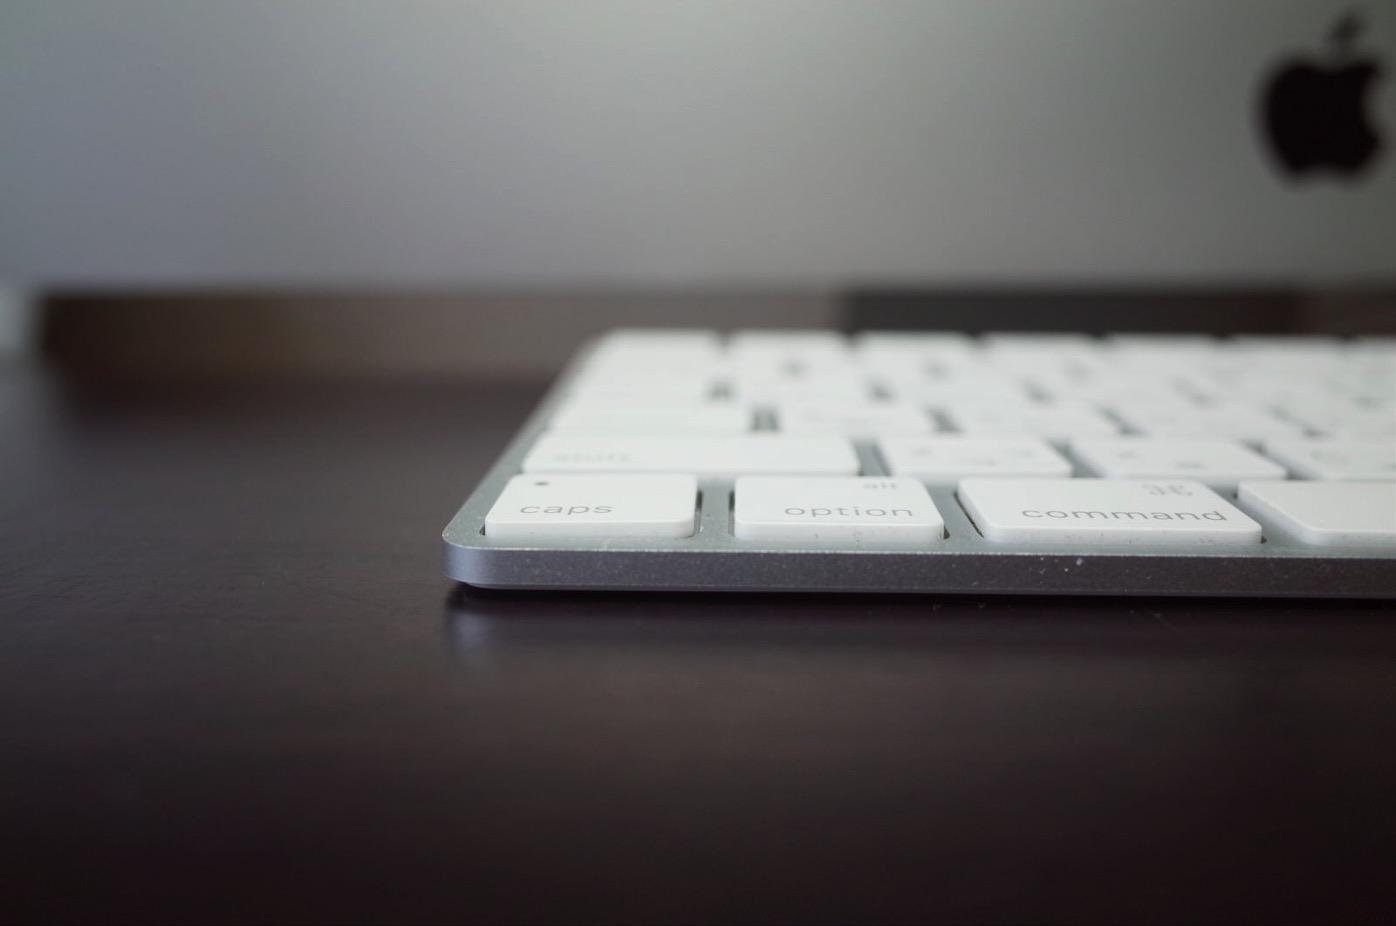 Magic Keyboard(テンキー付き)- 日本語(JIS)-7